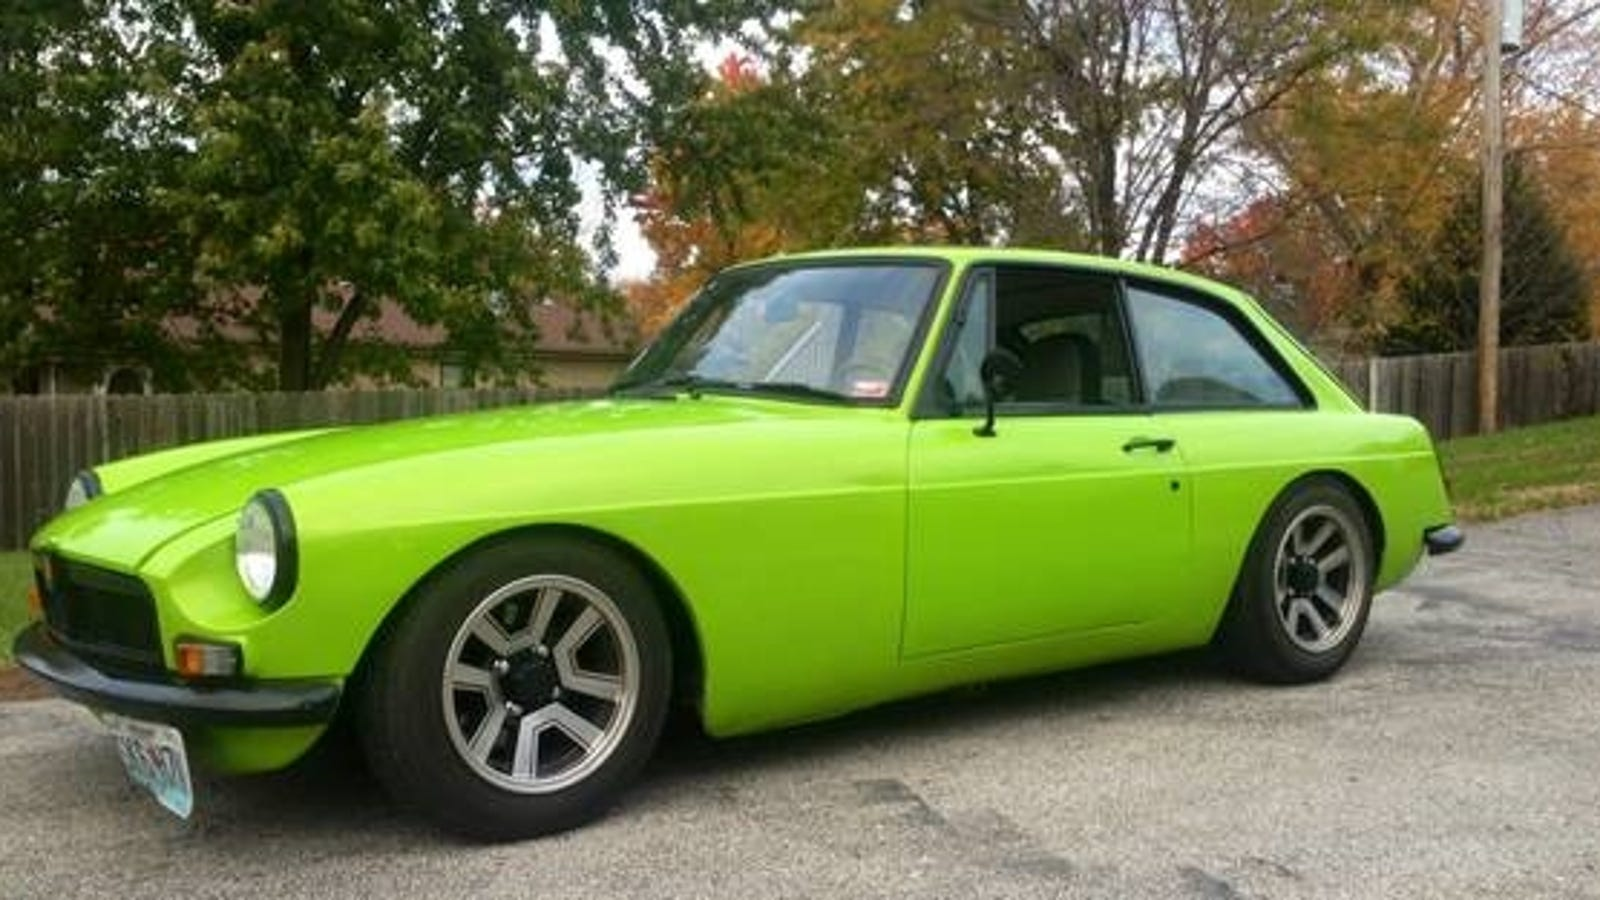 Buy A Margarita Green MGBuick GT On Craigslist For $6,500